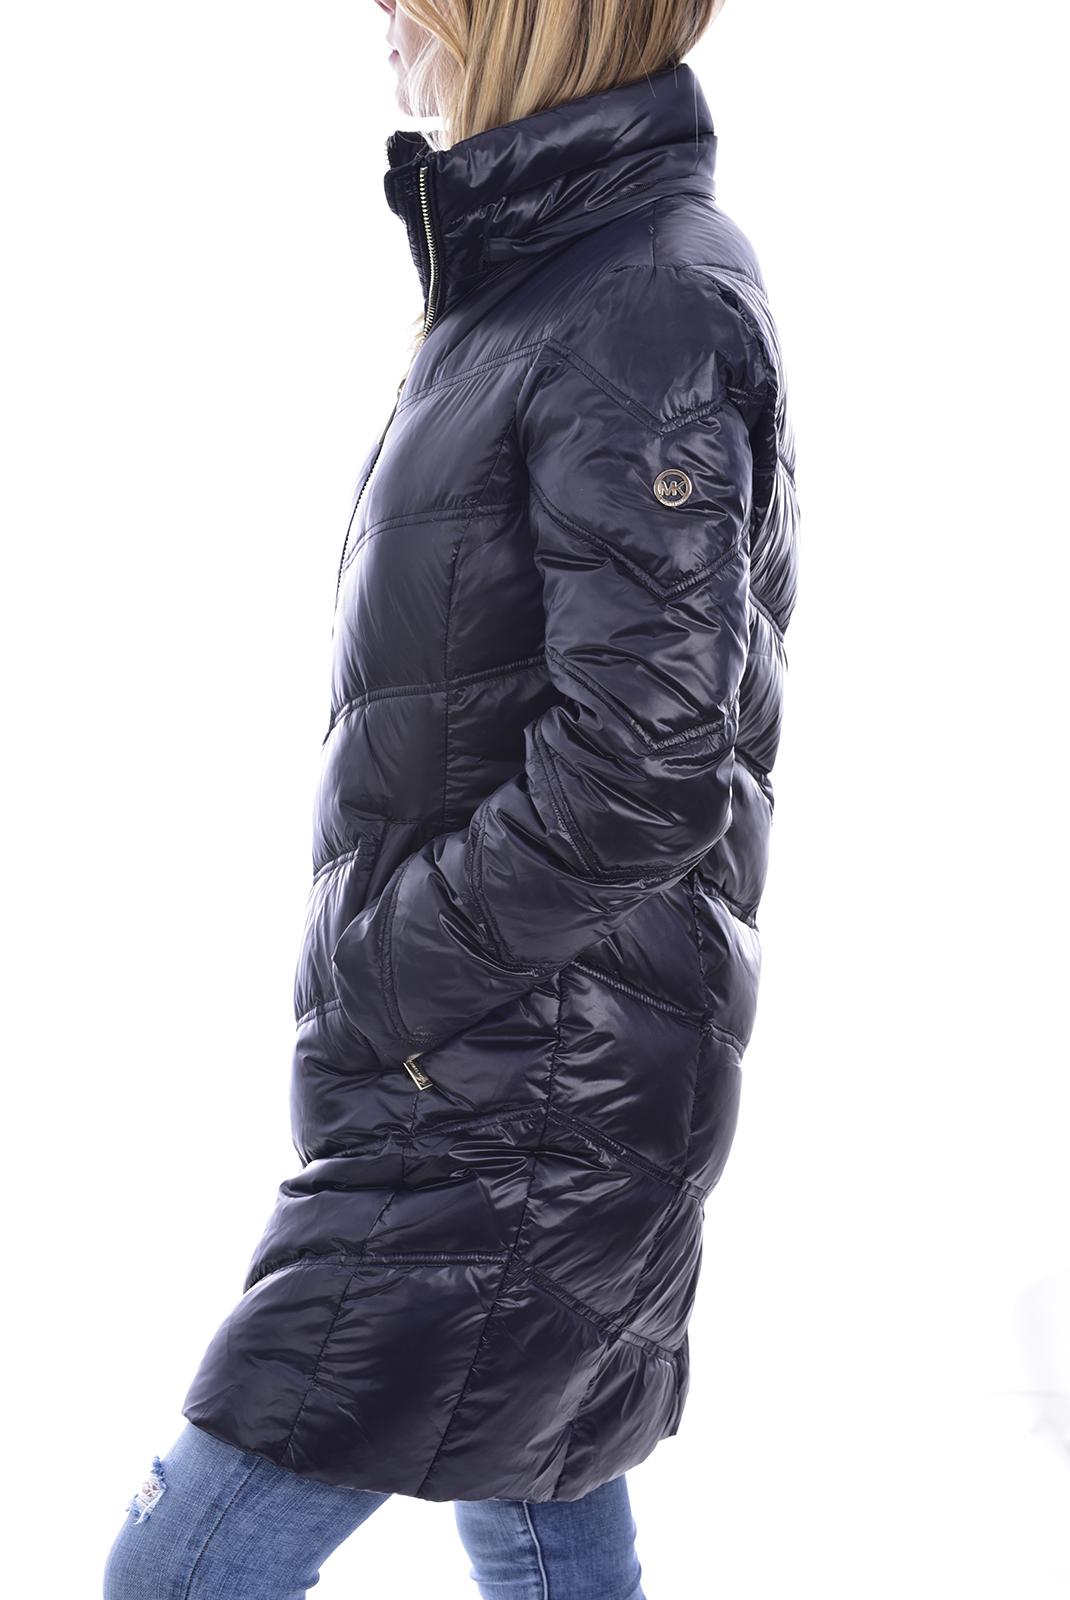 Vestes & blousons  Michael Kors 77T4462M82 MARINE